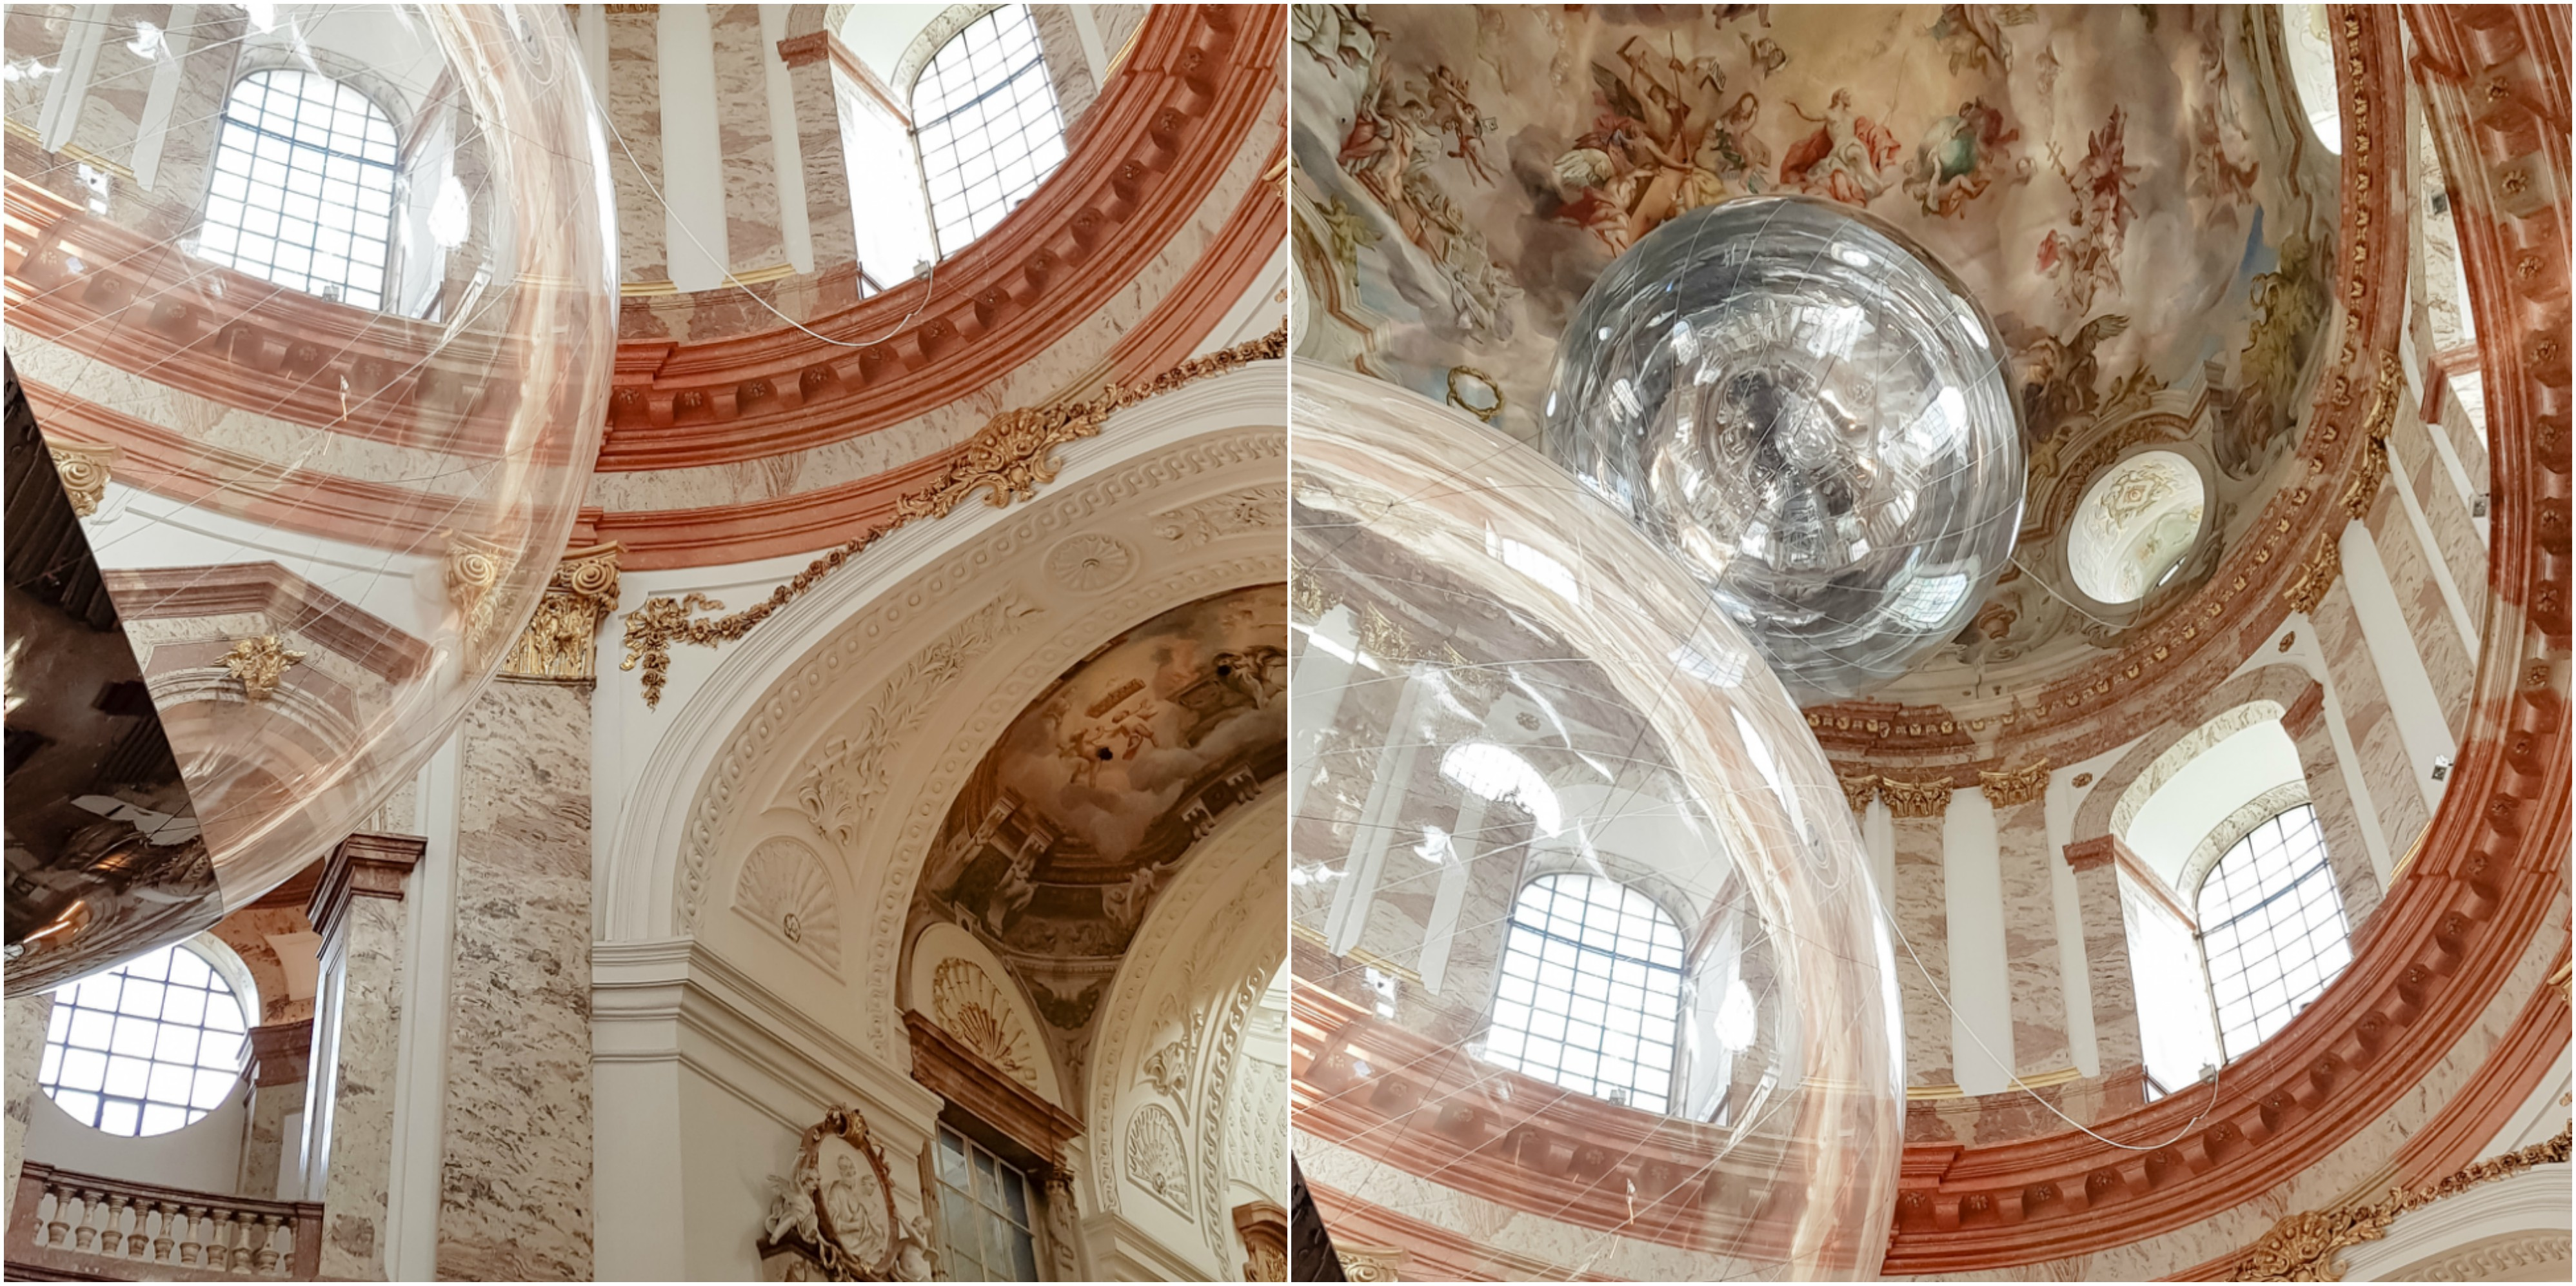 Eglise-St-Charles-Vienne-Aerocene